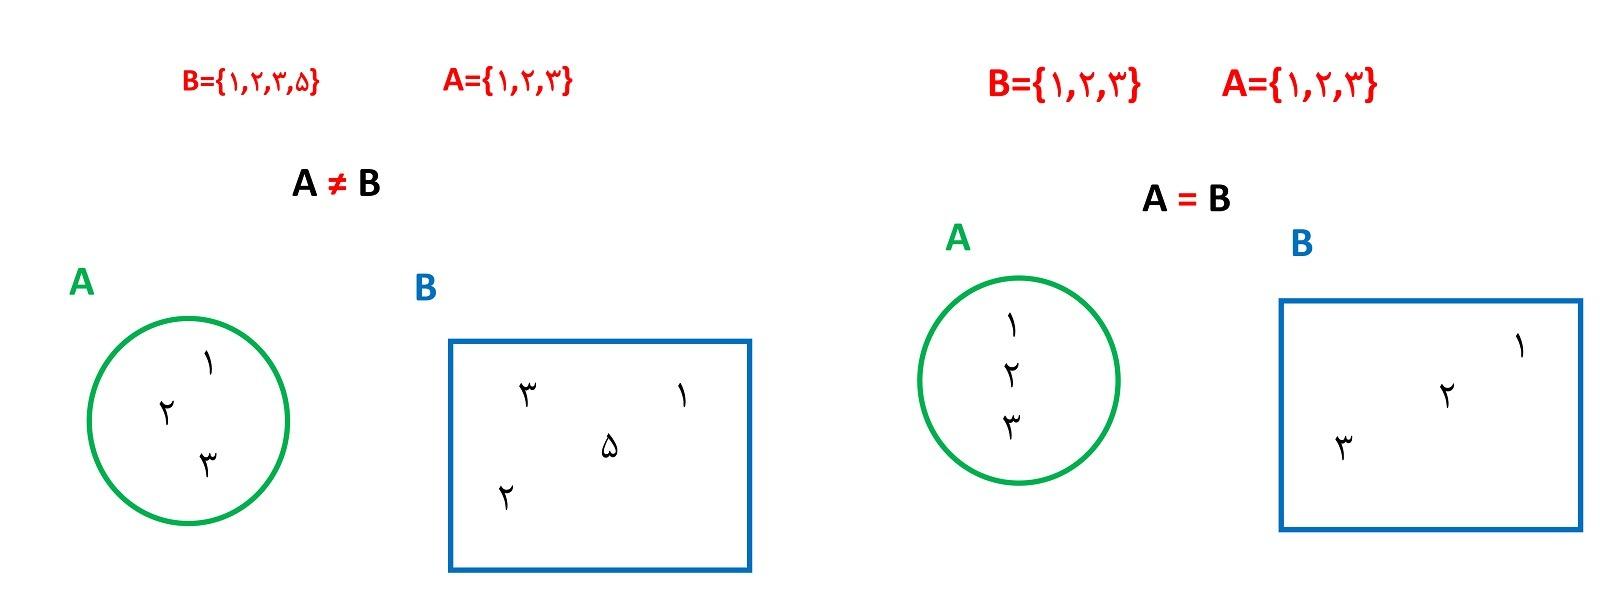 ریاضی نهم فصل اول، تساوی دو مجموعه ، نابرابری دو مجموعه